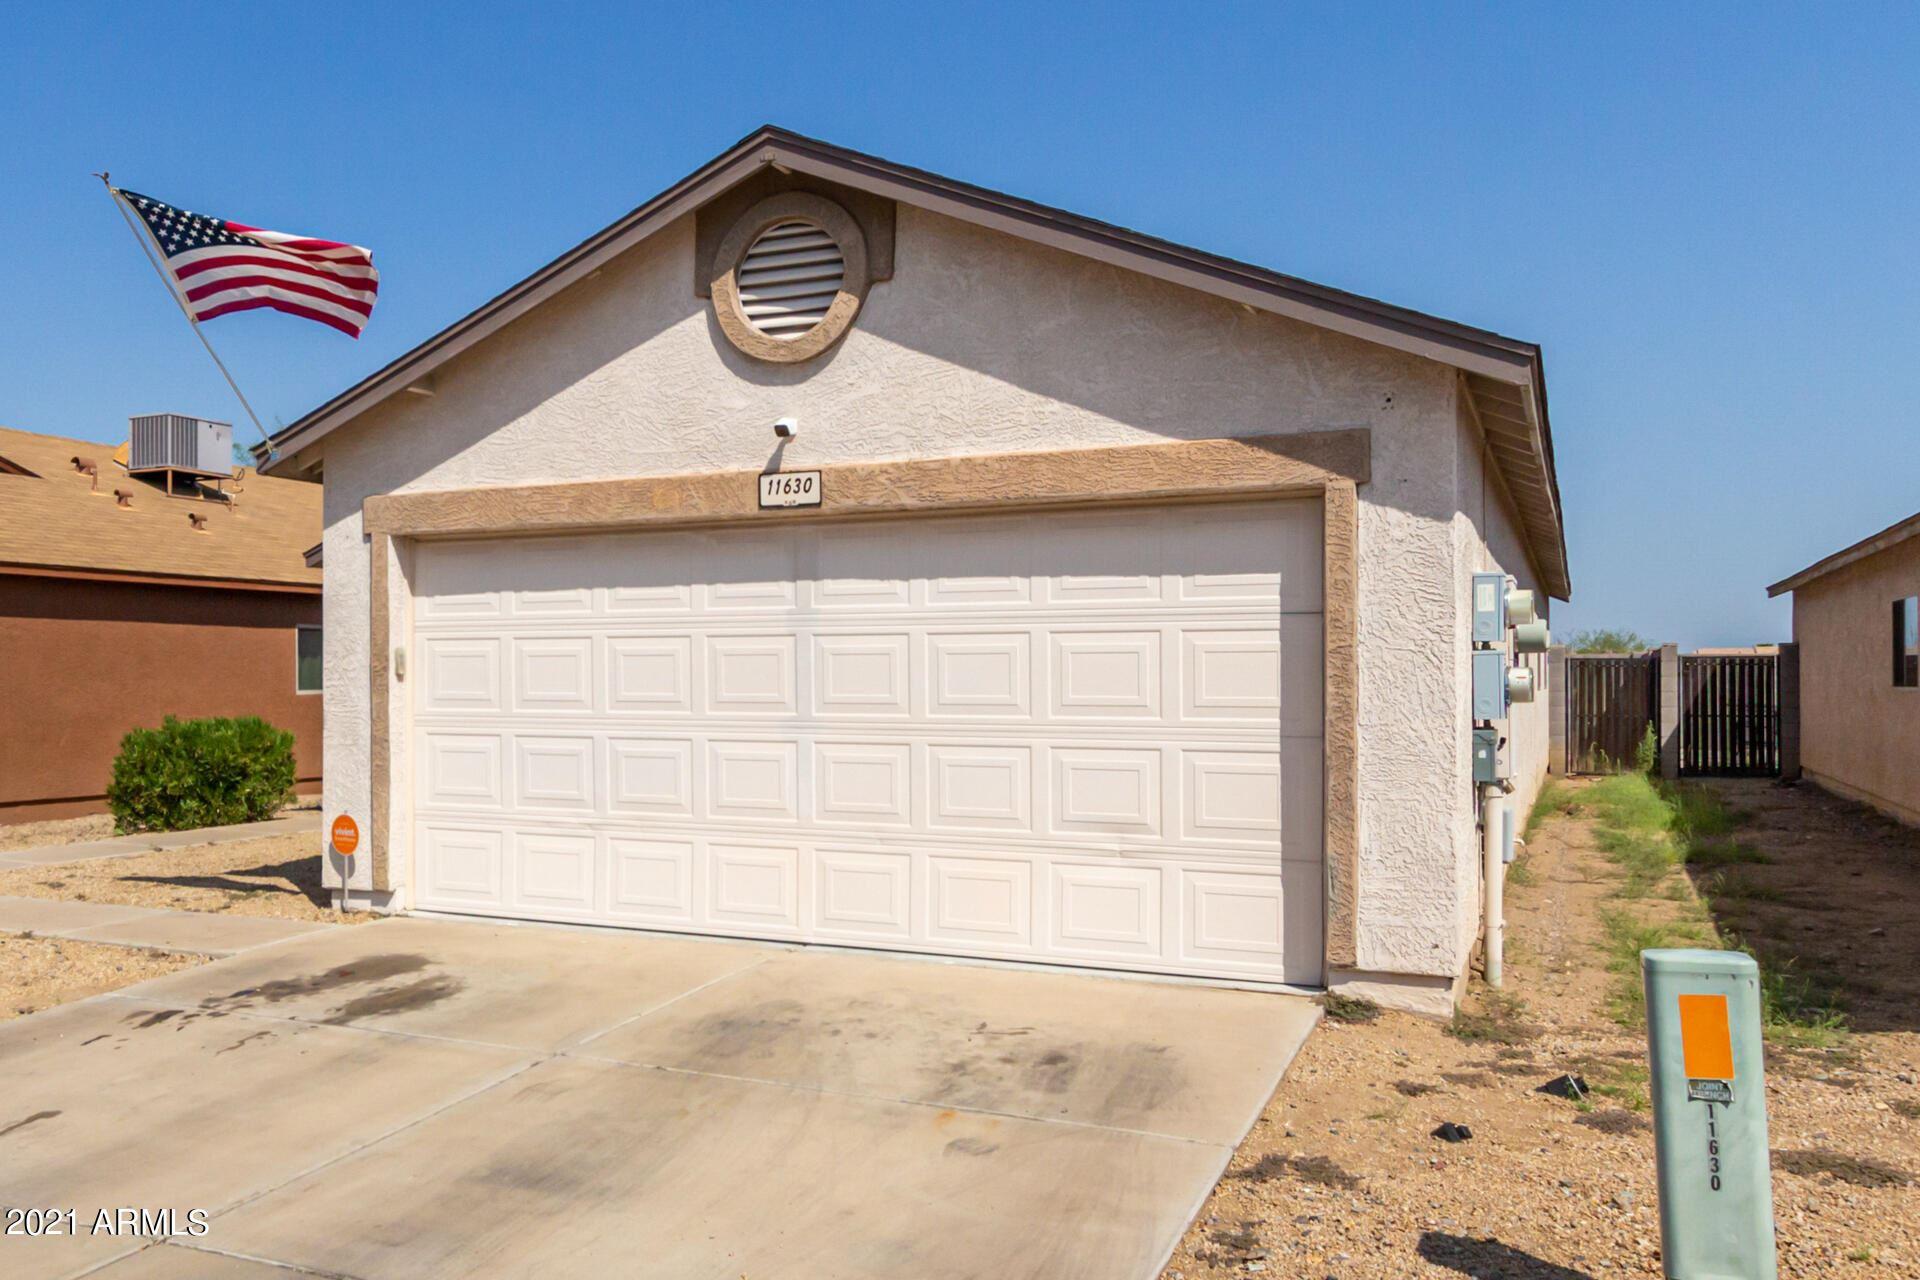 Photo of 11630 W Windrose Avenue, El Mirage, AZ 85335 (MLS # 6292078)